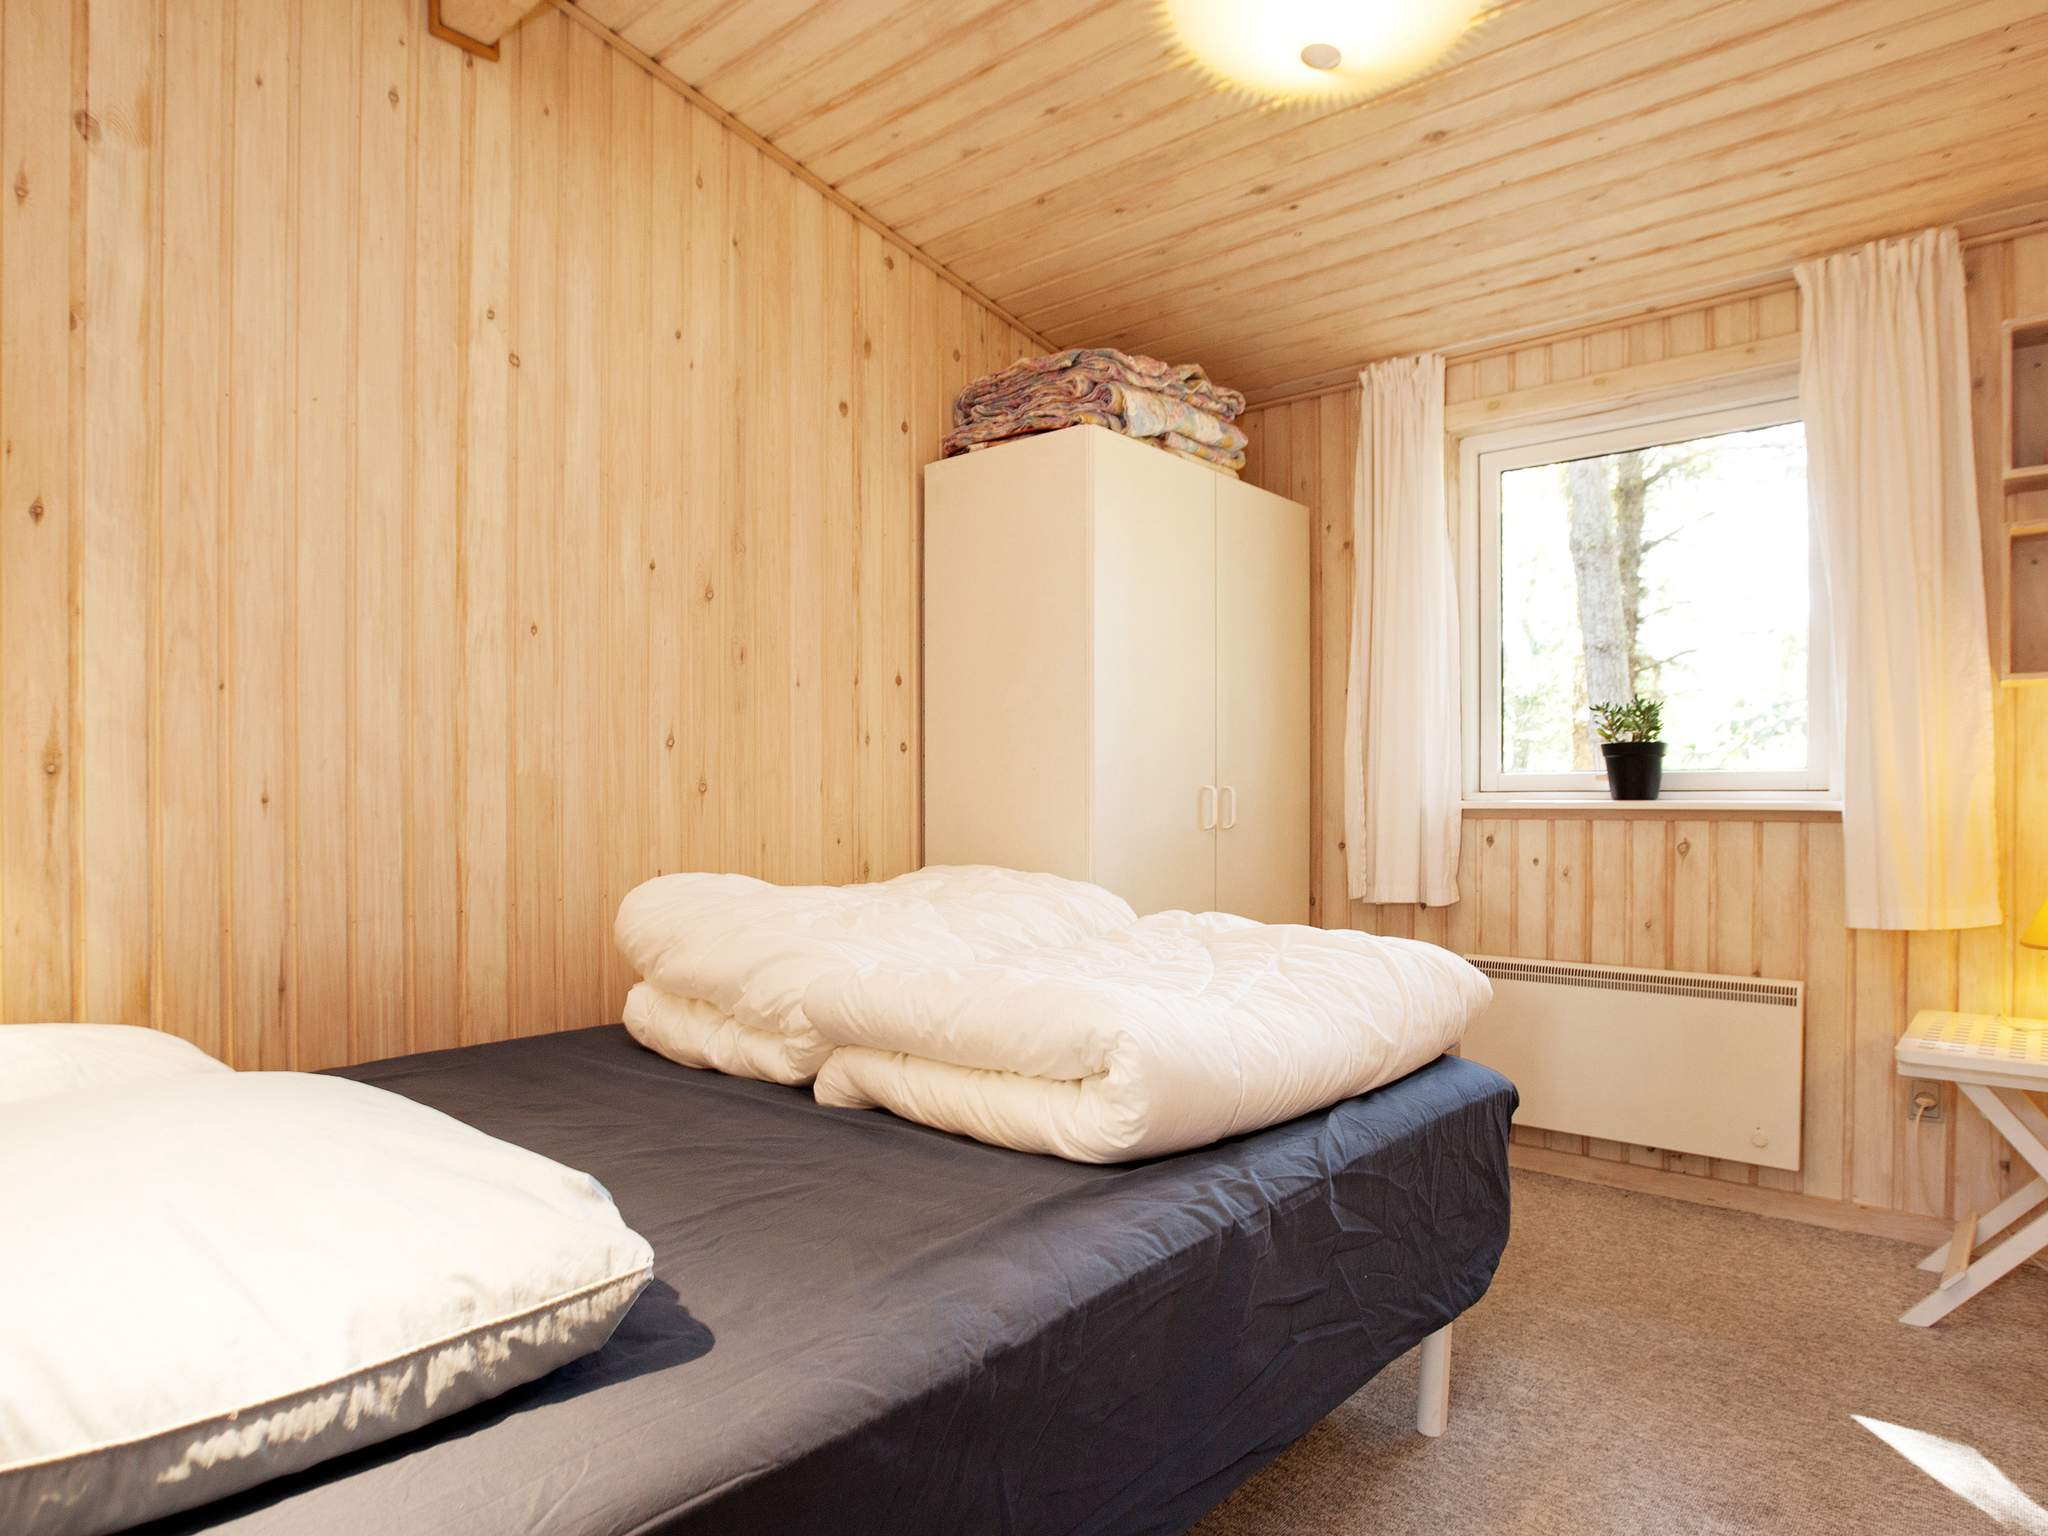 Maison de vacances Kramnitze (87262), Kramnitse, , Lolland, Danemark, image 14